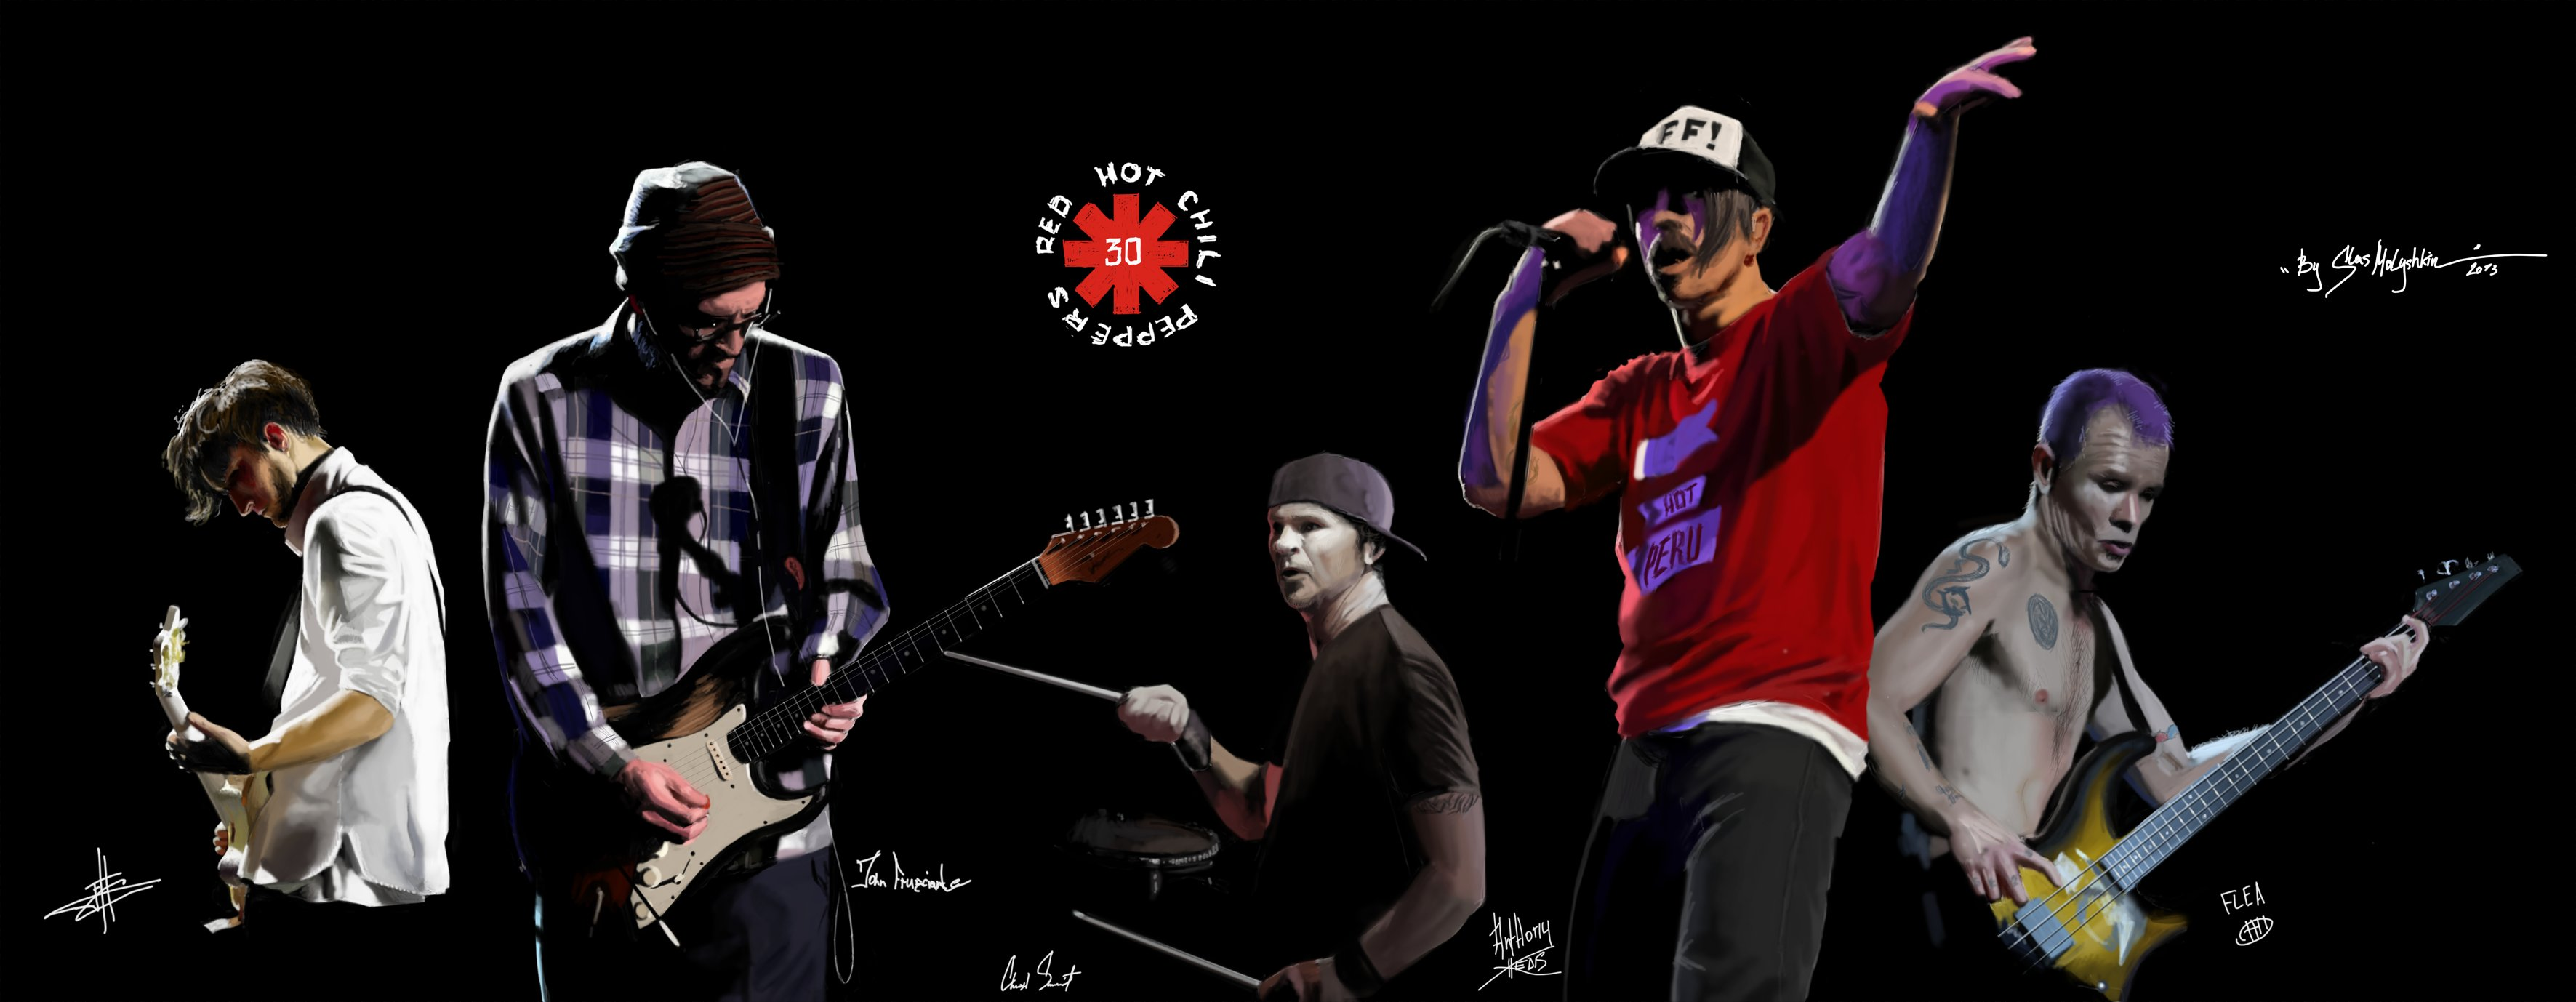 Red Hot Chili Peppers Funk Rock Alternative 7 Wallpaper